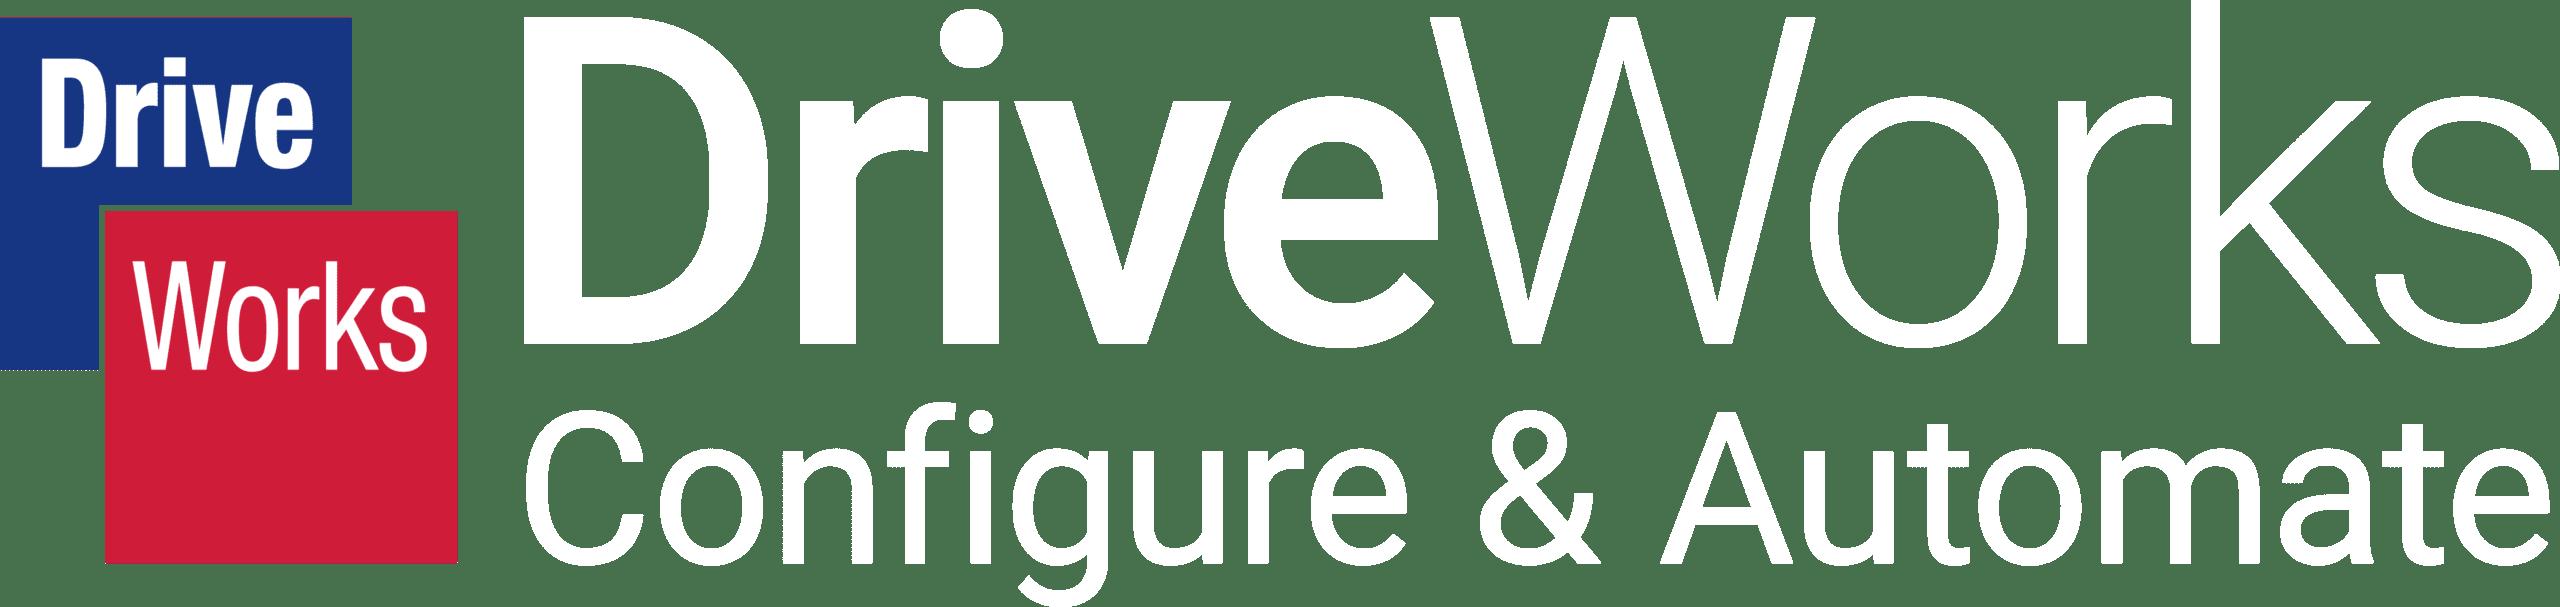 DriveWorks-Logo-Configure&Automate-White